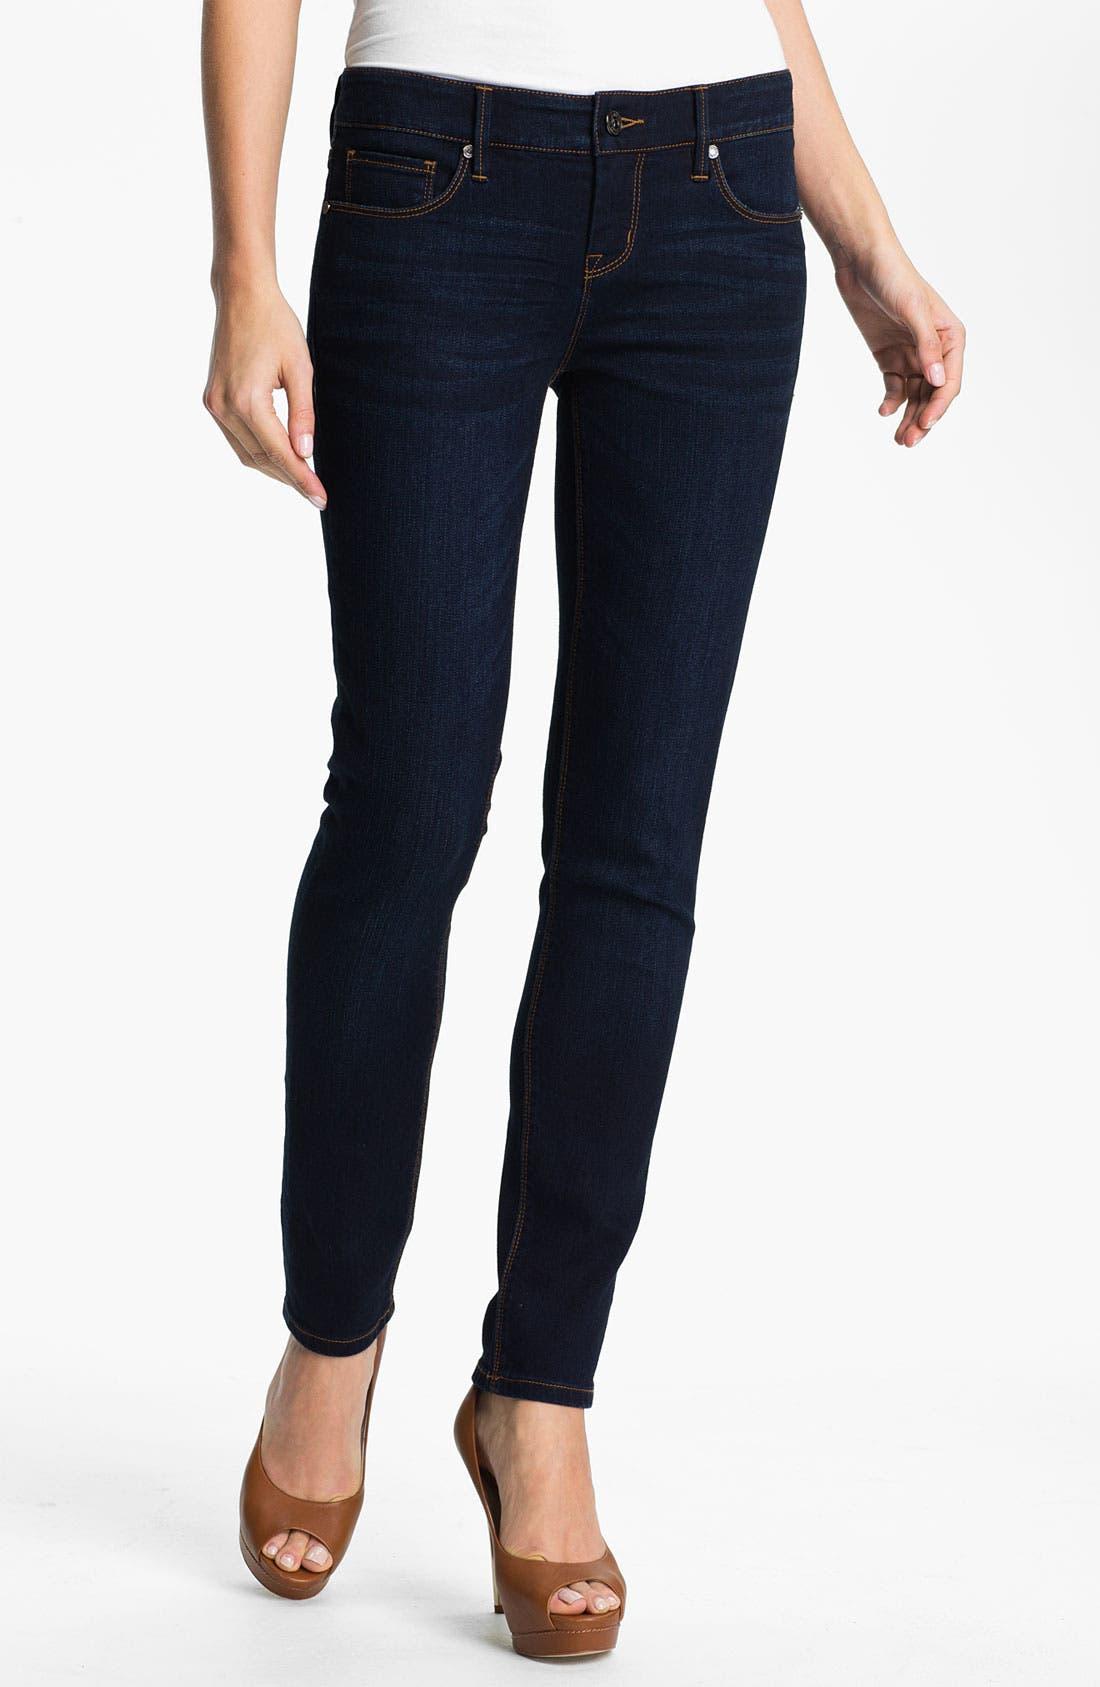 Main Image - Isaac Mizrahi Jeans 'Samantha' Skinny Jeans (Madison)